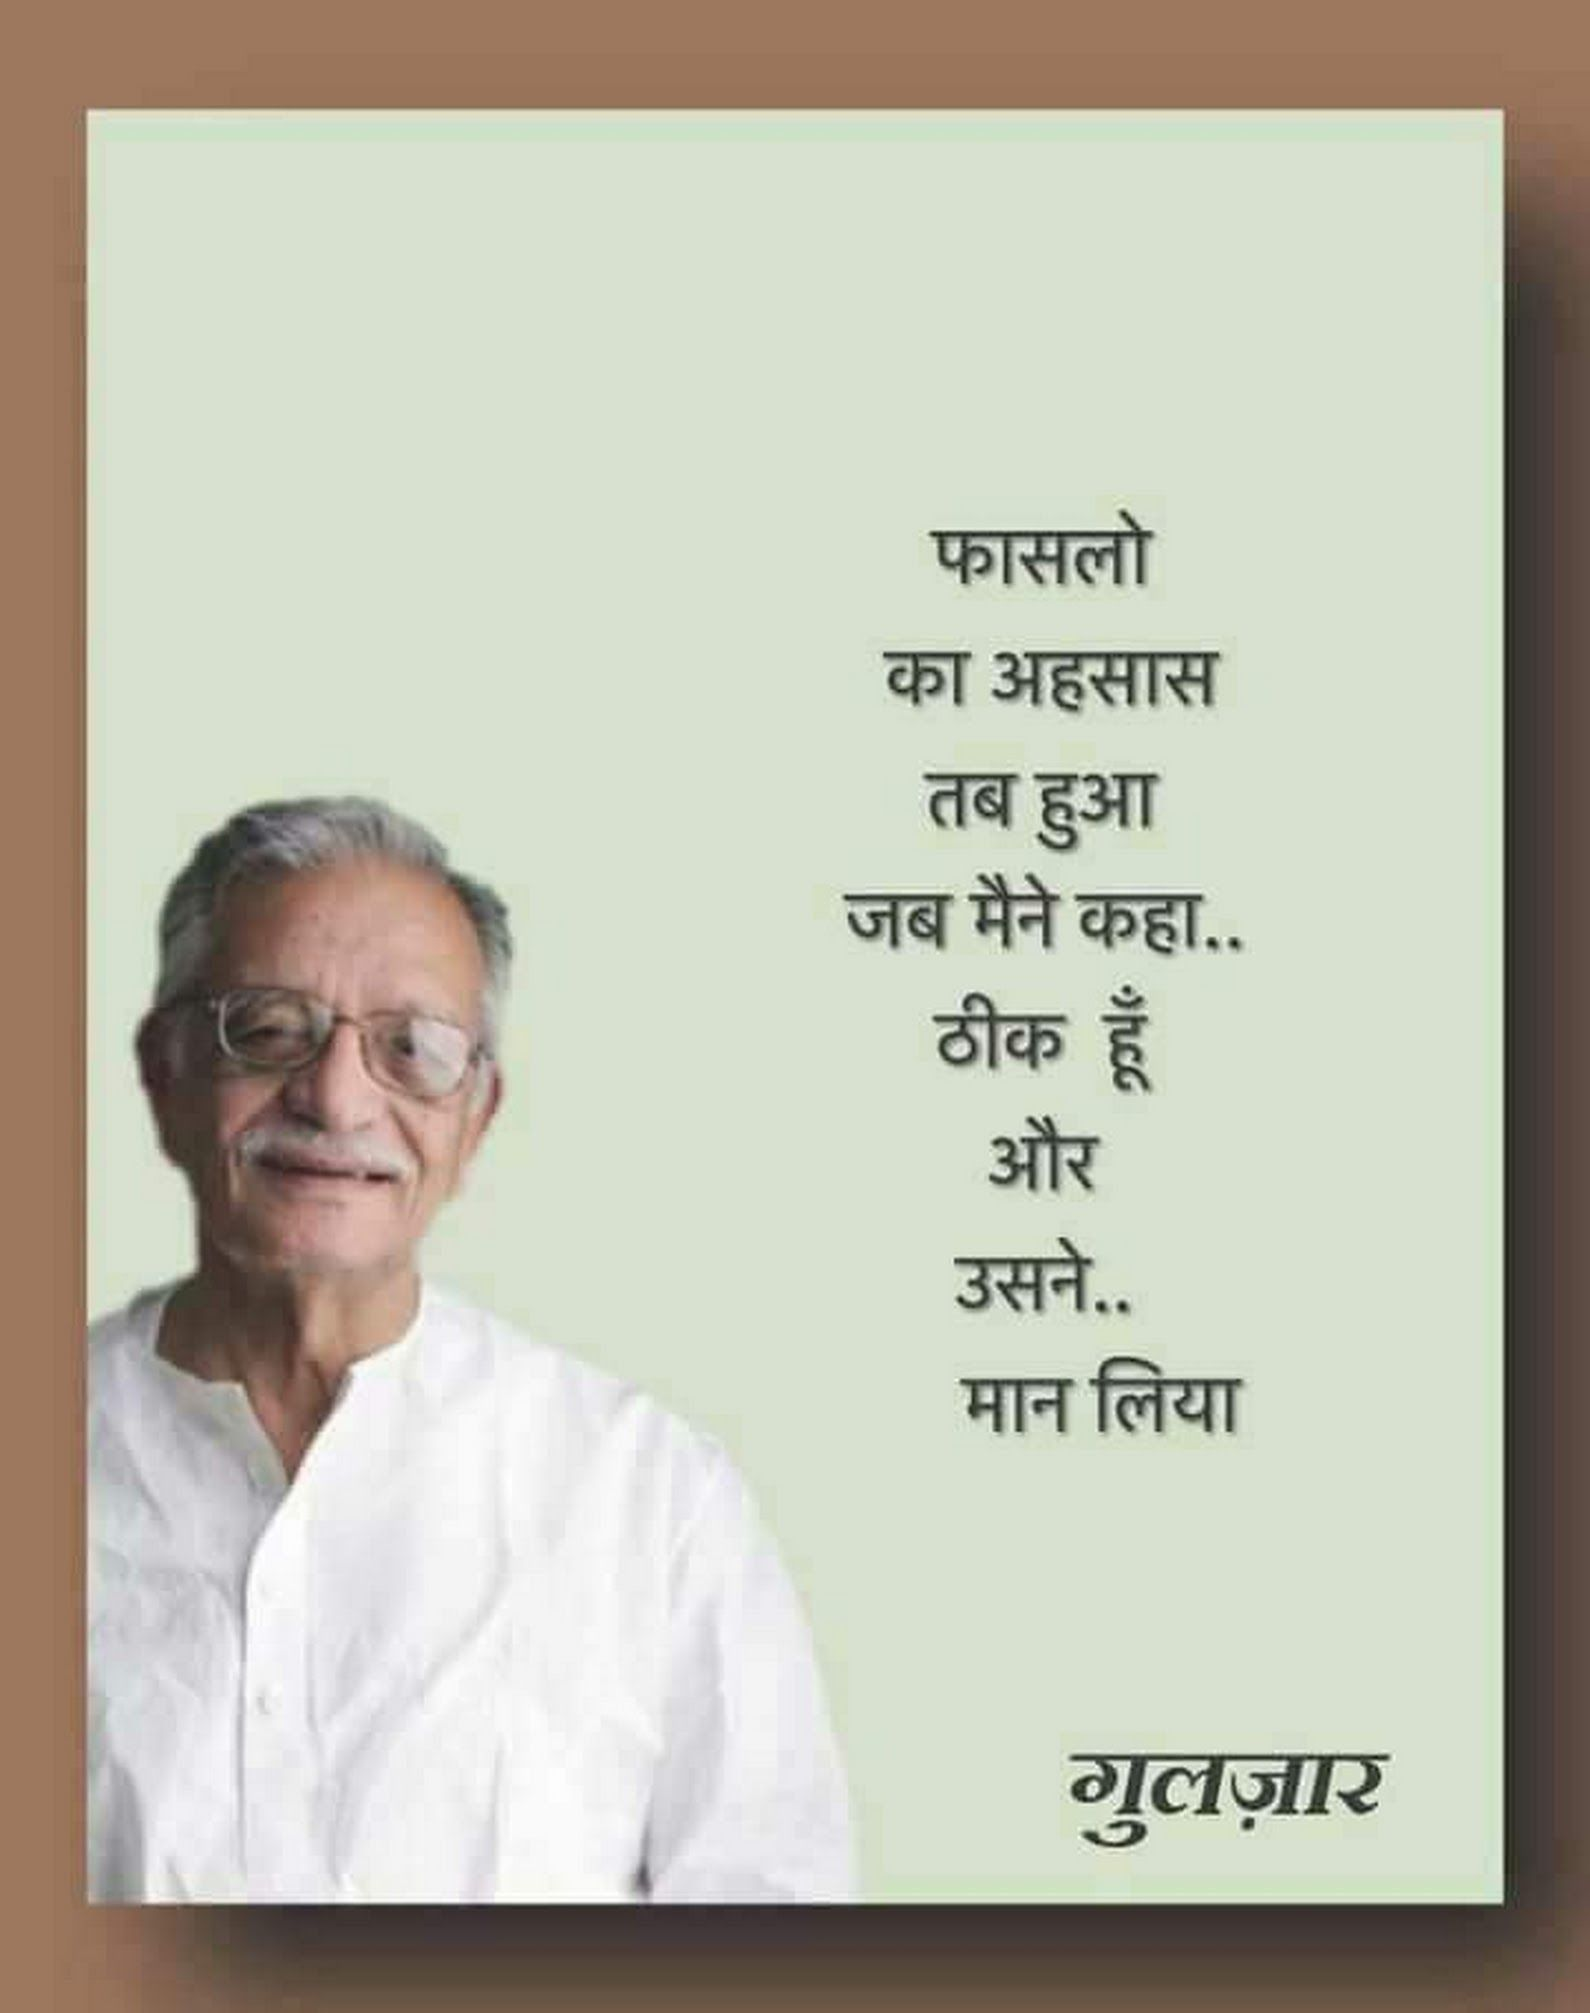 अस्मिता कुलकर्णी - Google+ | Hindi quotes